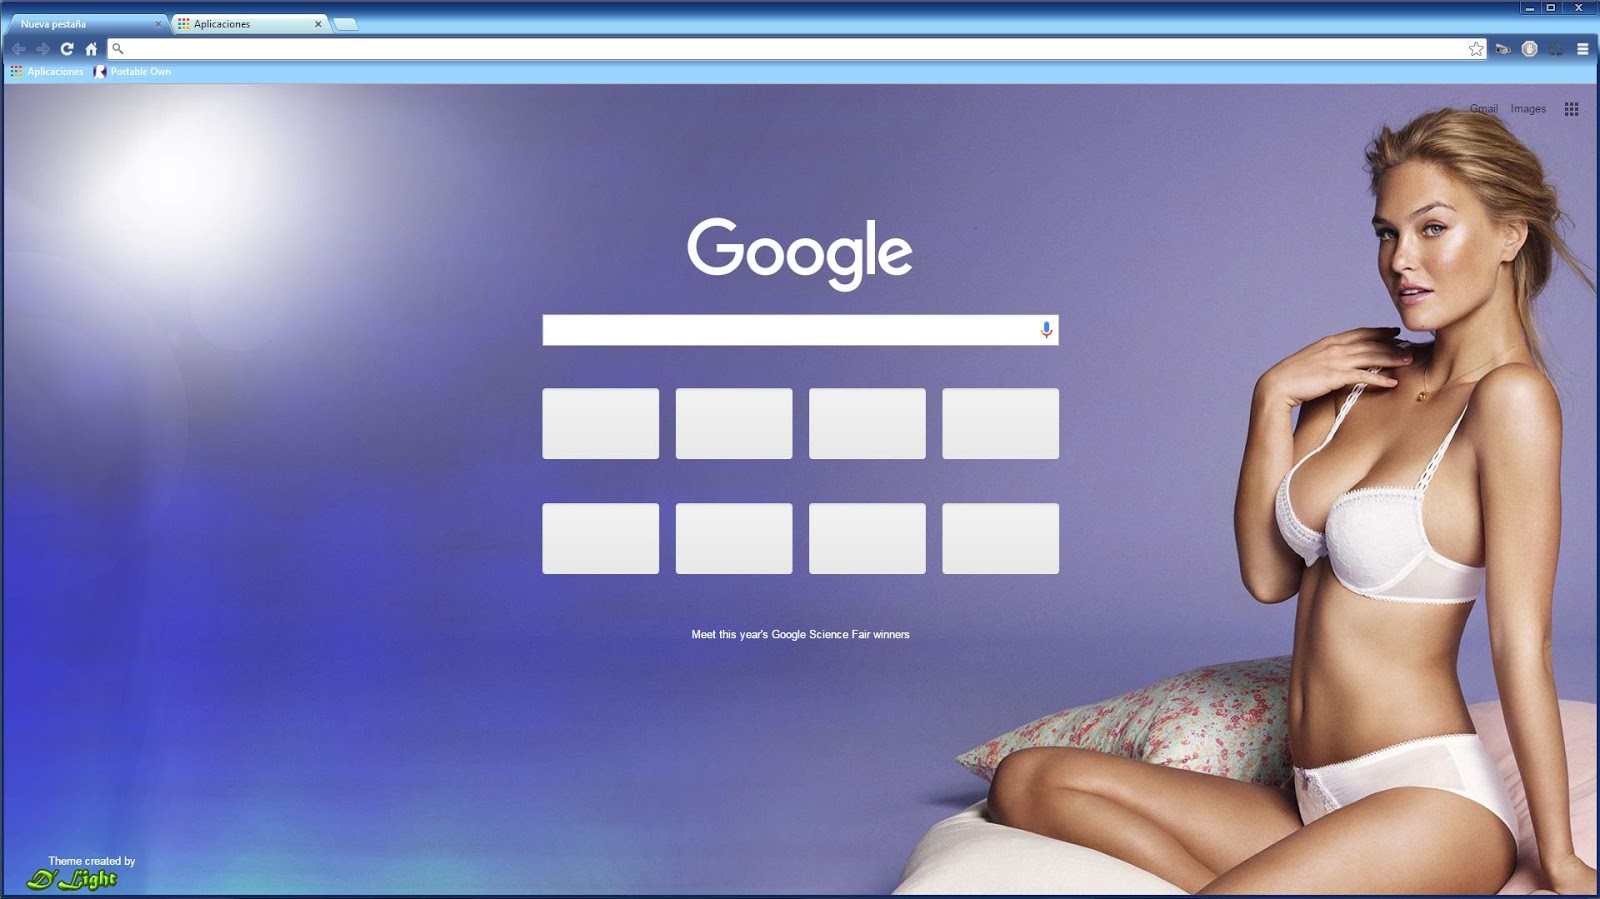 Google themes browser - Bar Refaeli Hd Theme For Google Chrome Browser